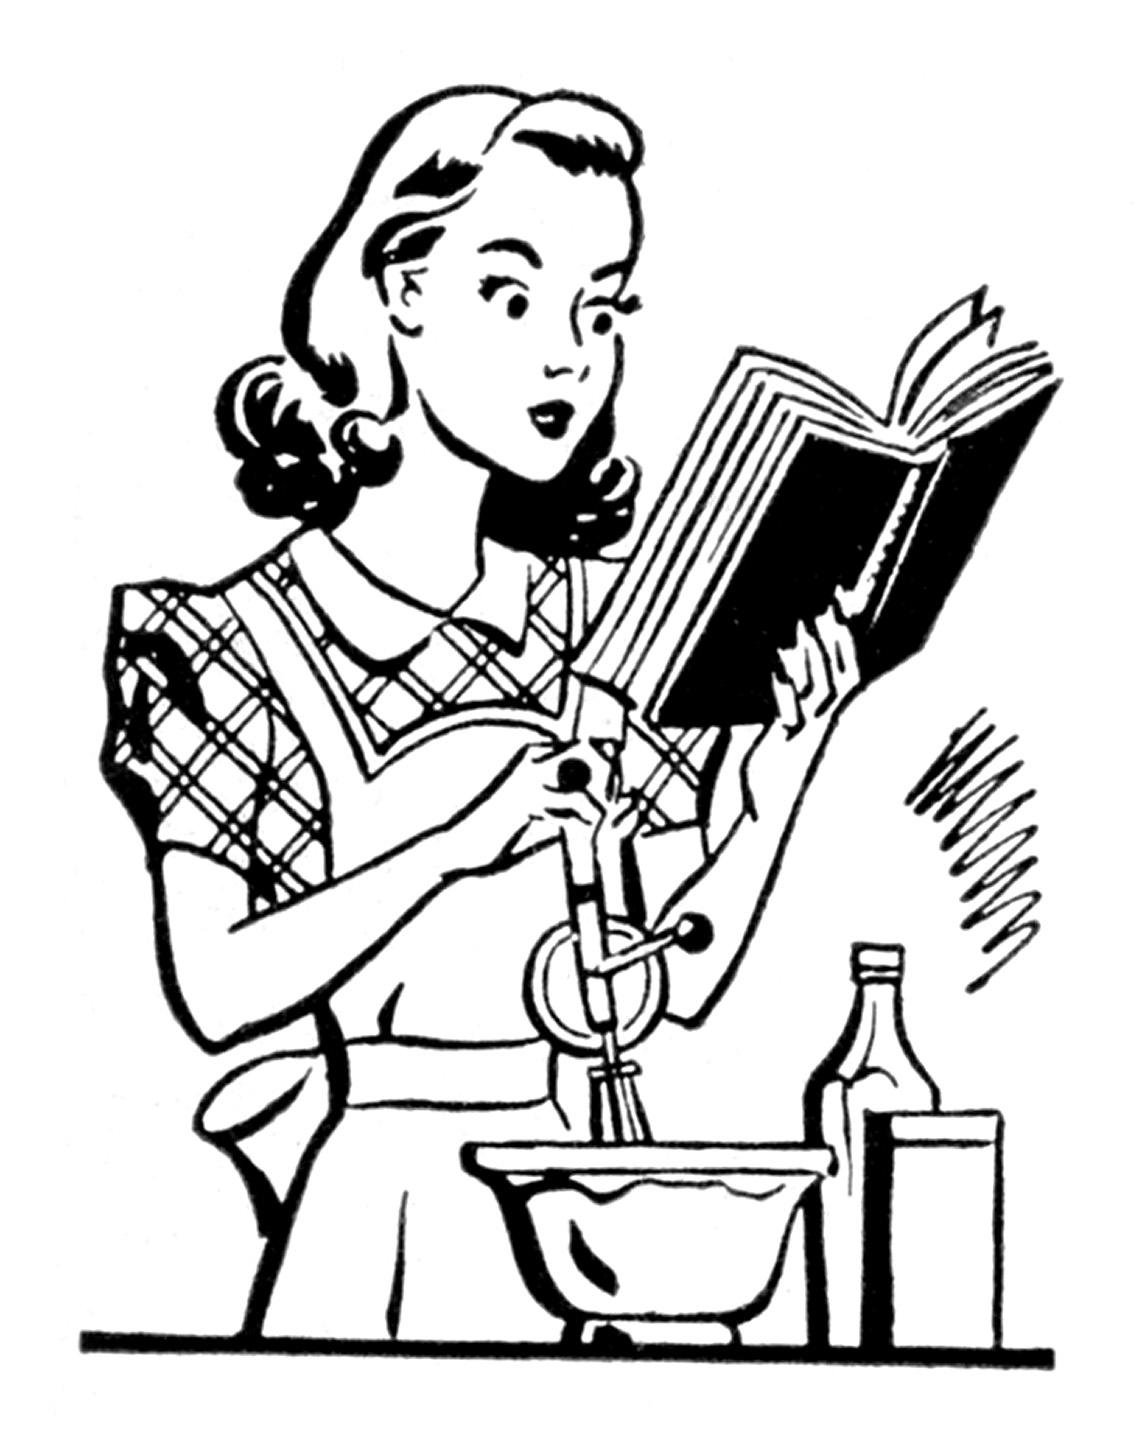 Baking Mom / Wife: Tons of retro clip art via The Graphics Fairy.